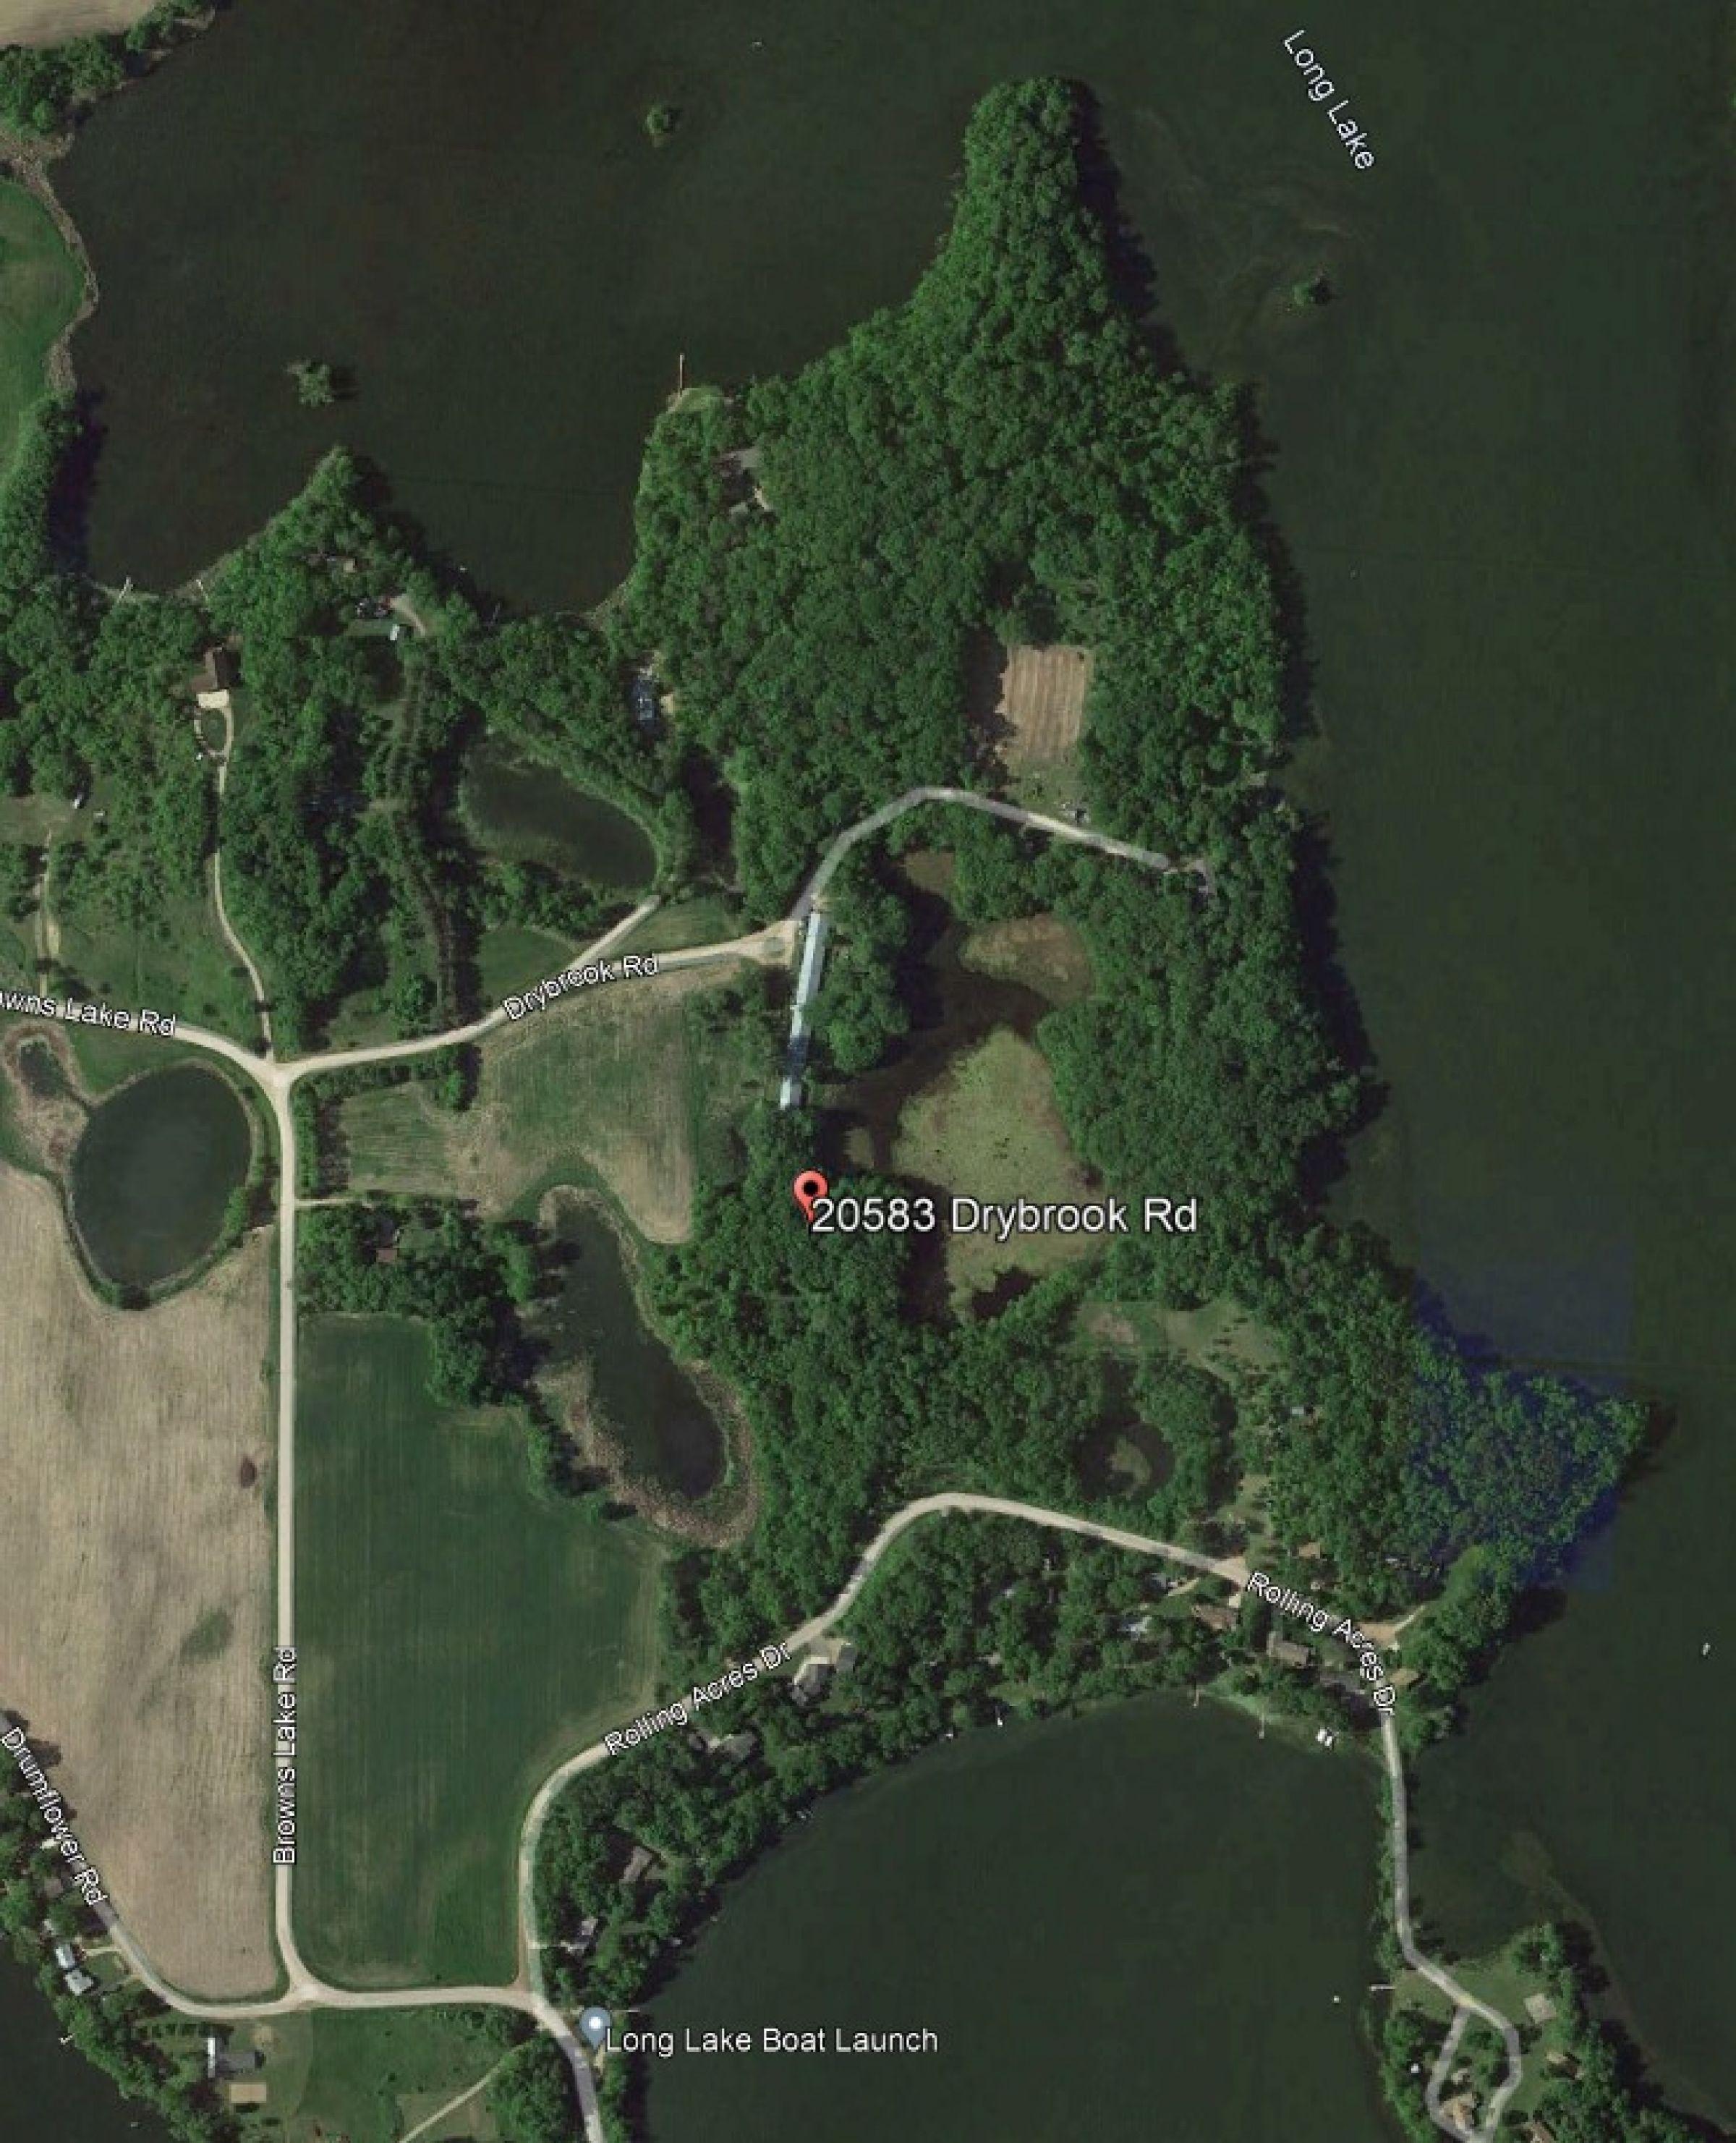 residential-development-land-stearns-county-minnesota-67-acres-listing-number-15781-0-2021-10-01-172311.jpg